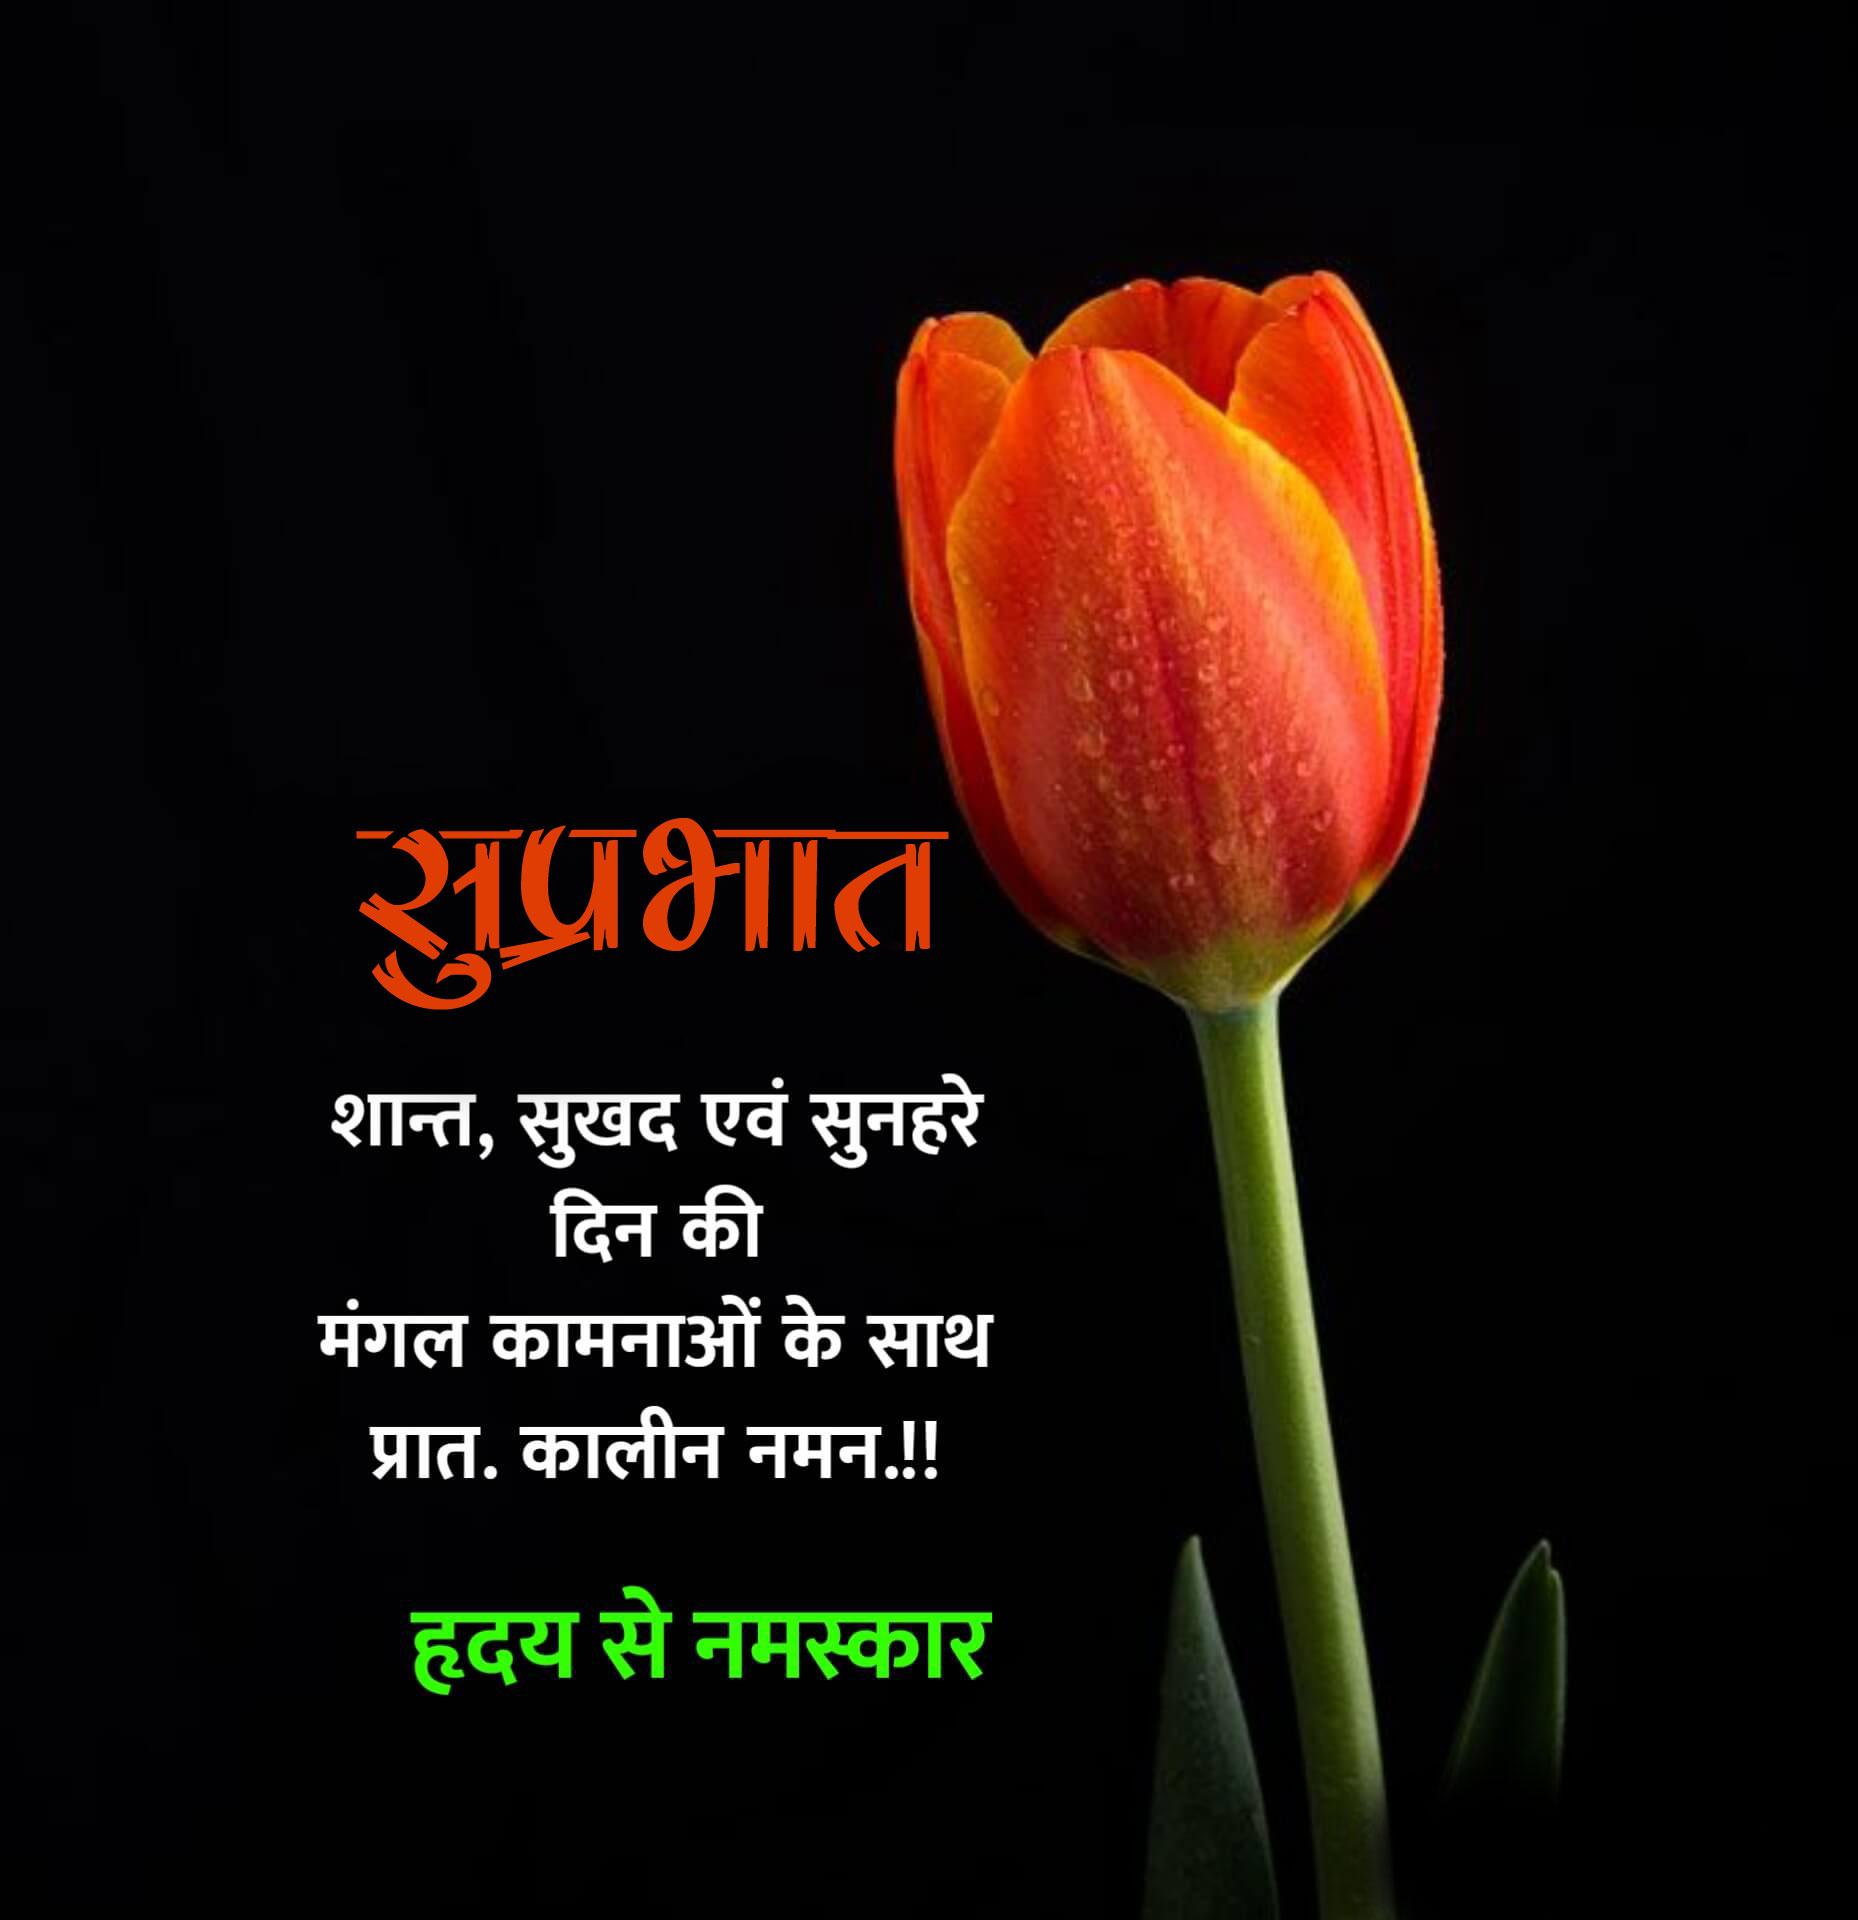 New Beautiful Suprabhat Images photo hd